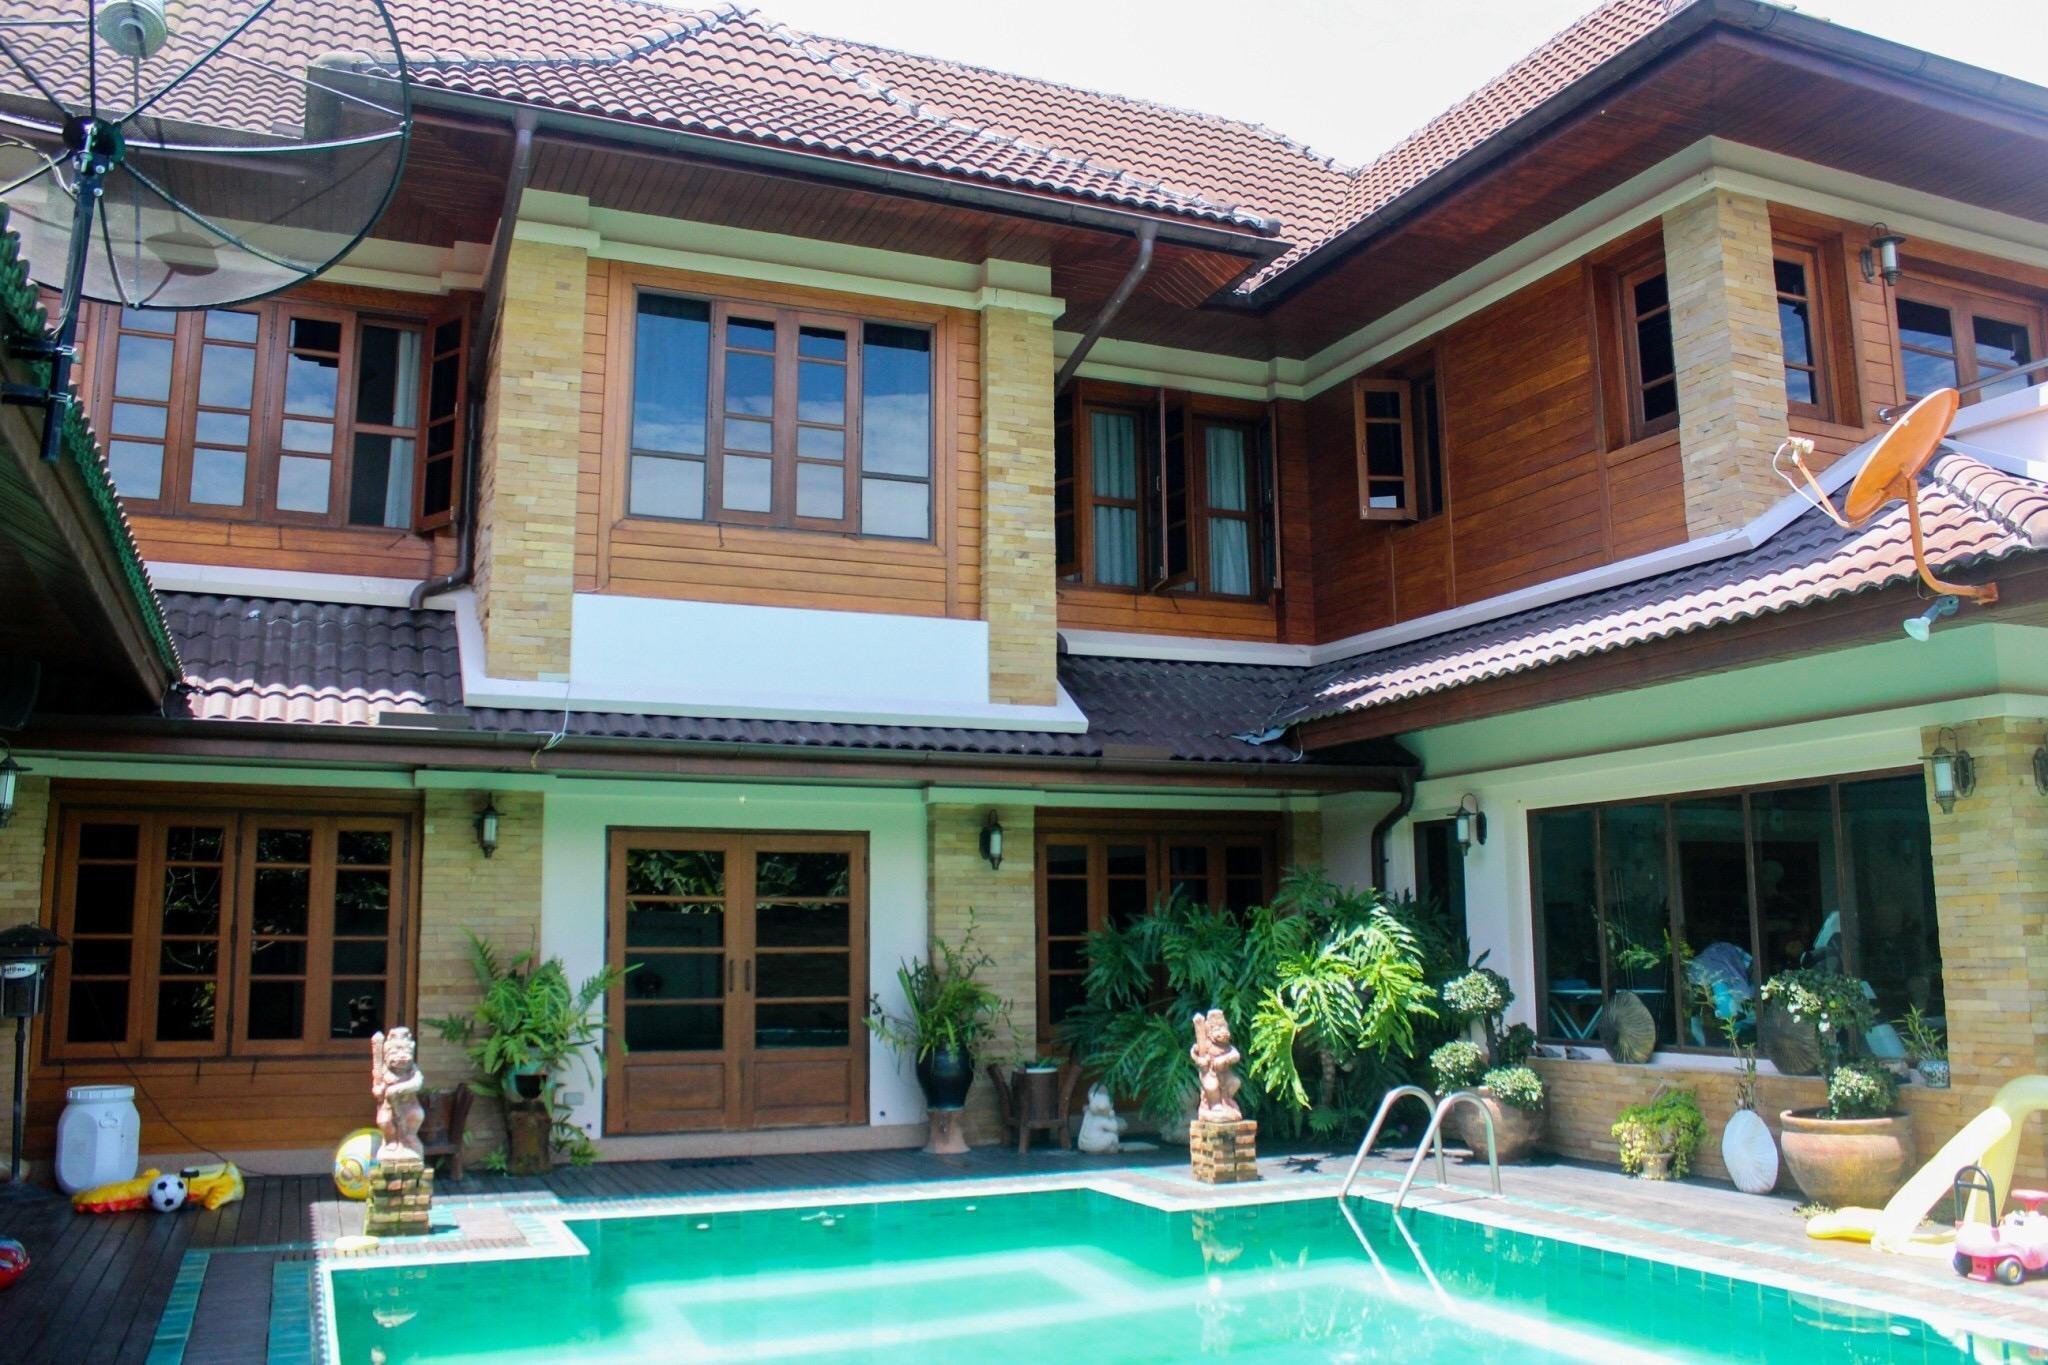 Bosang Country Villa -Umbrella village-Hot springs บ้านเดี่ยว 4 ห้องนอน 6 ห้องน้ำส่วนตัว ขนาด 650 ตร.ม. – สันกำแพง